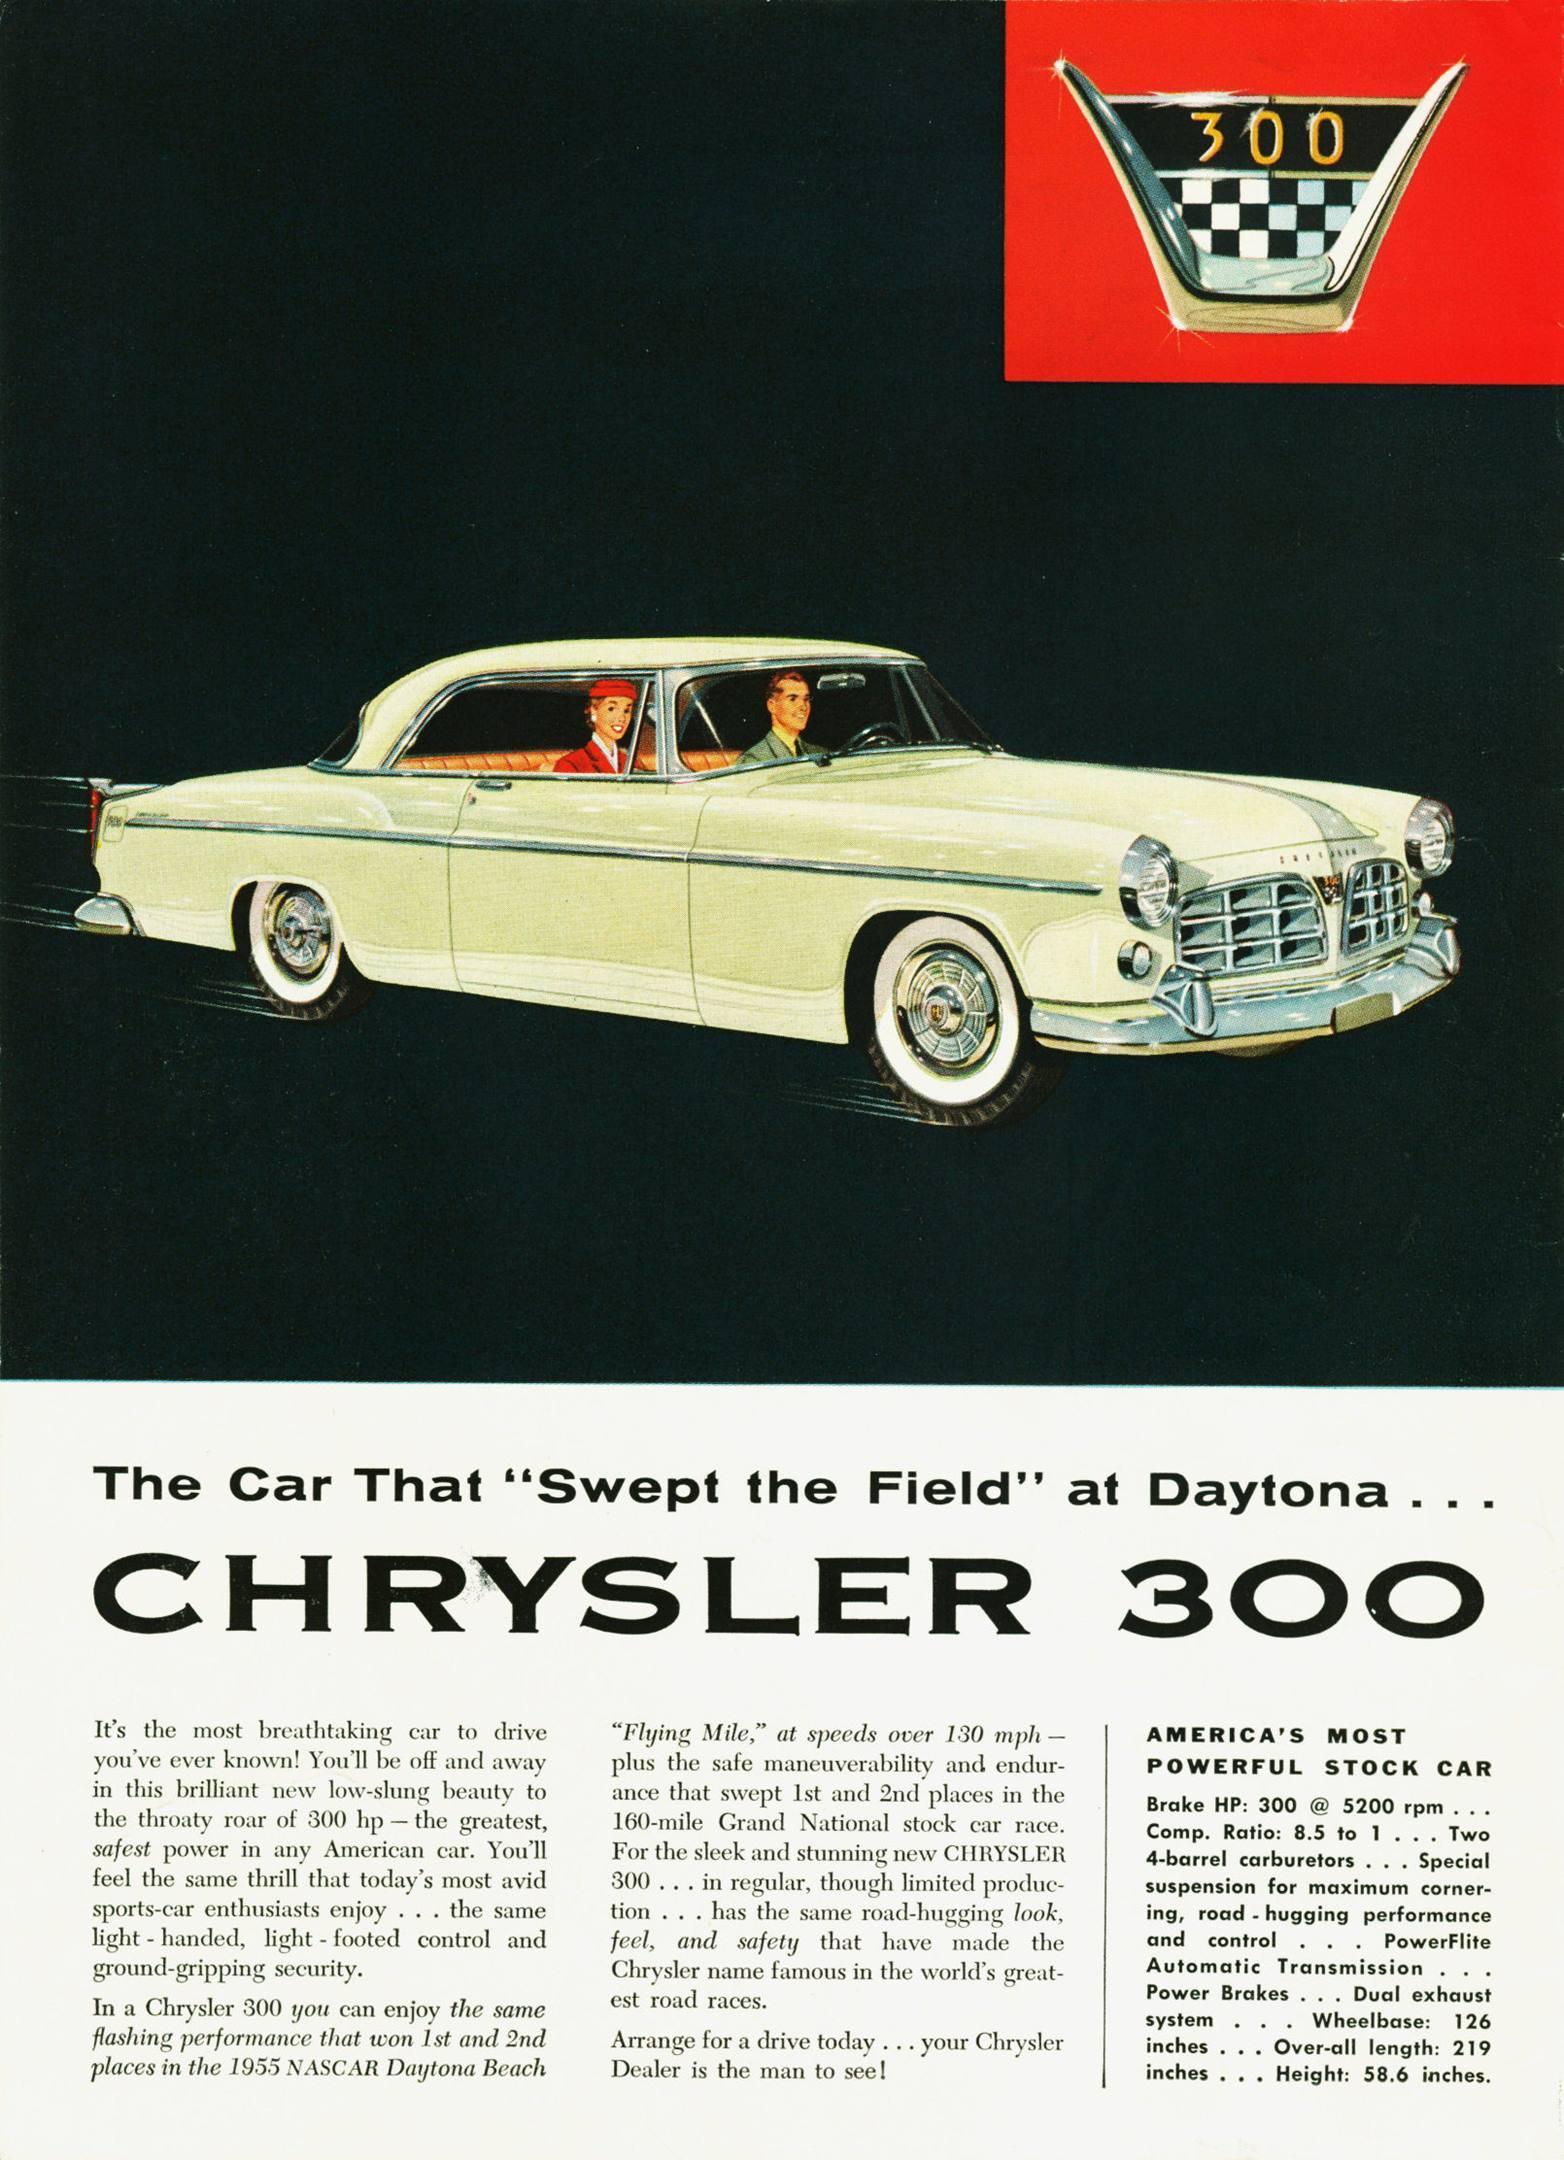 Chrysler 300 ad